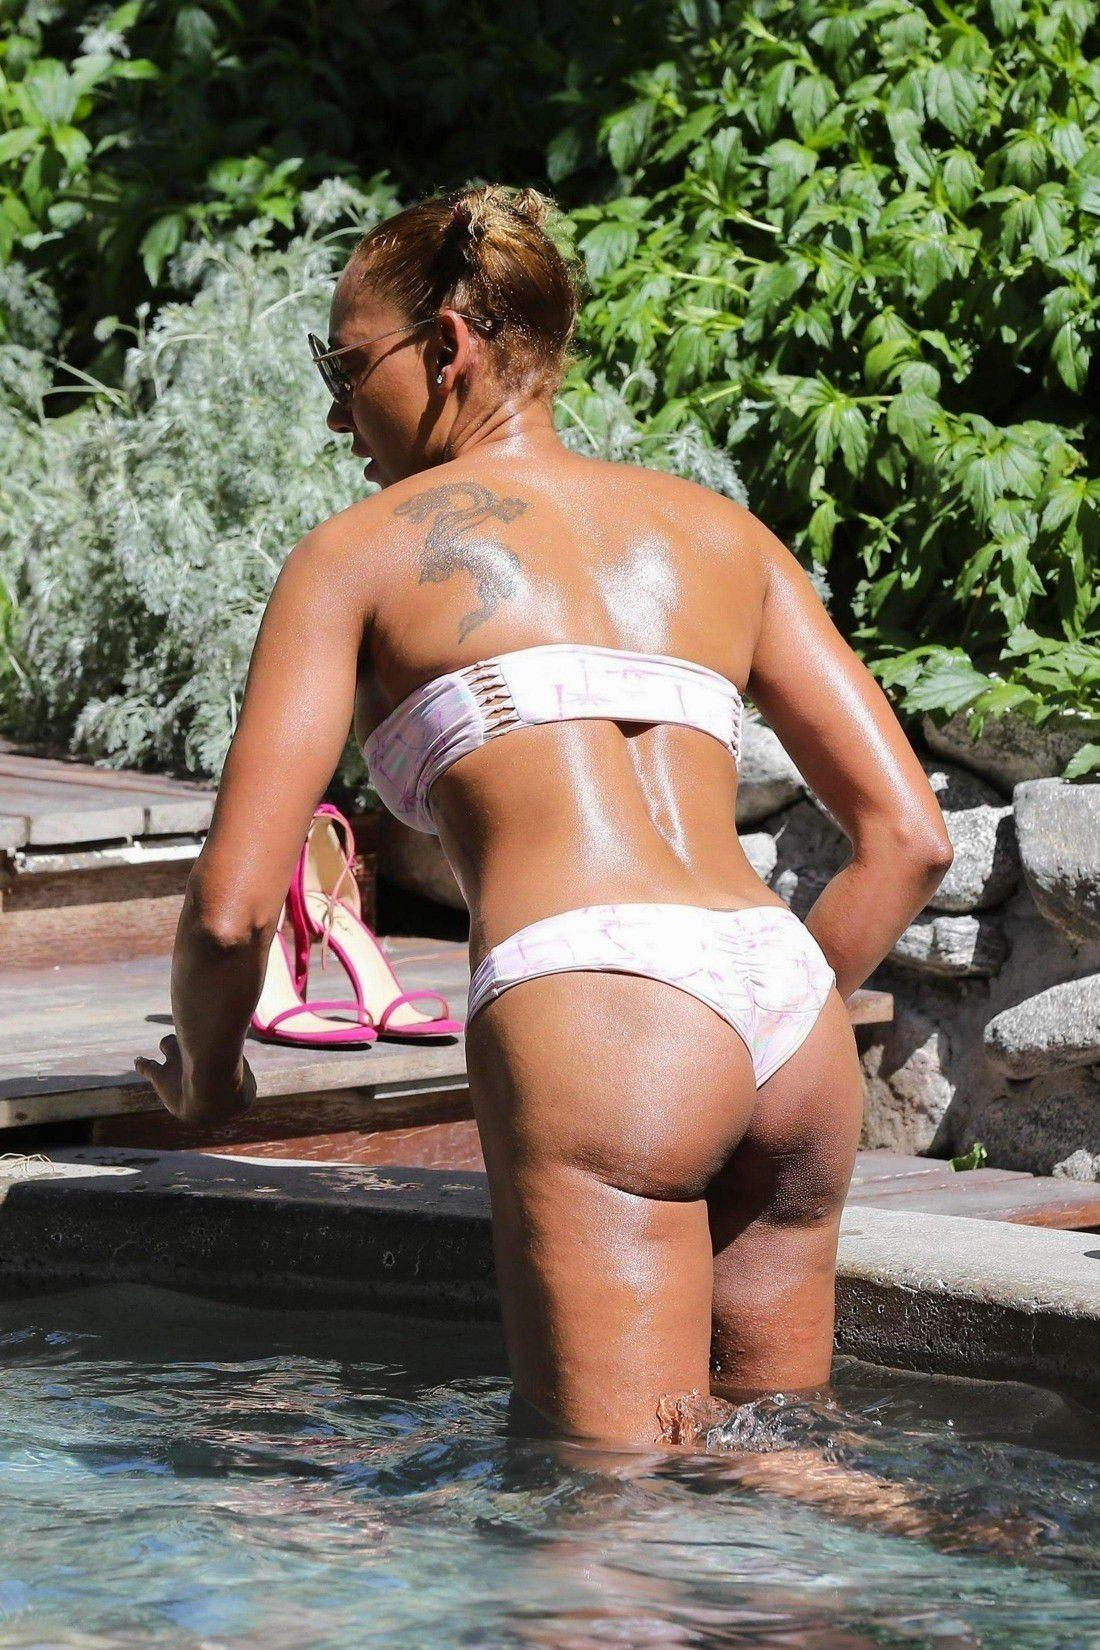 Melanie brown bikini pics